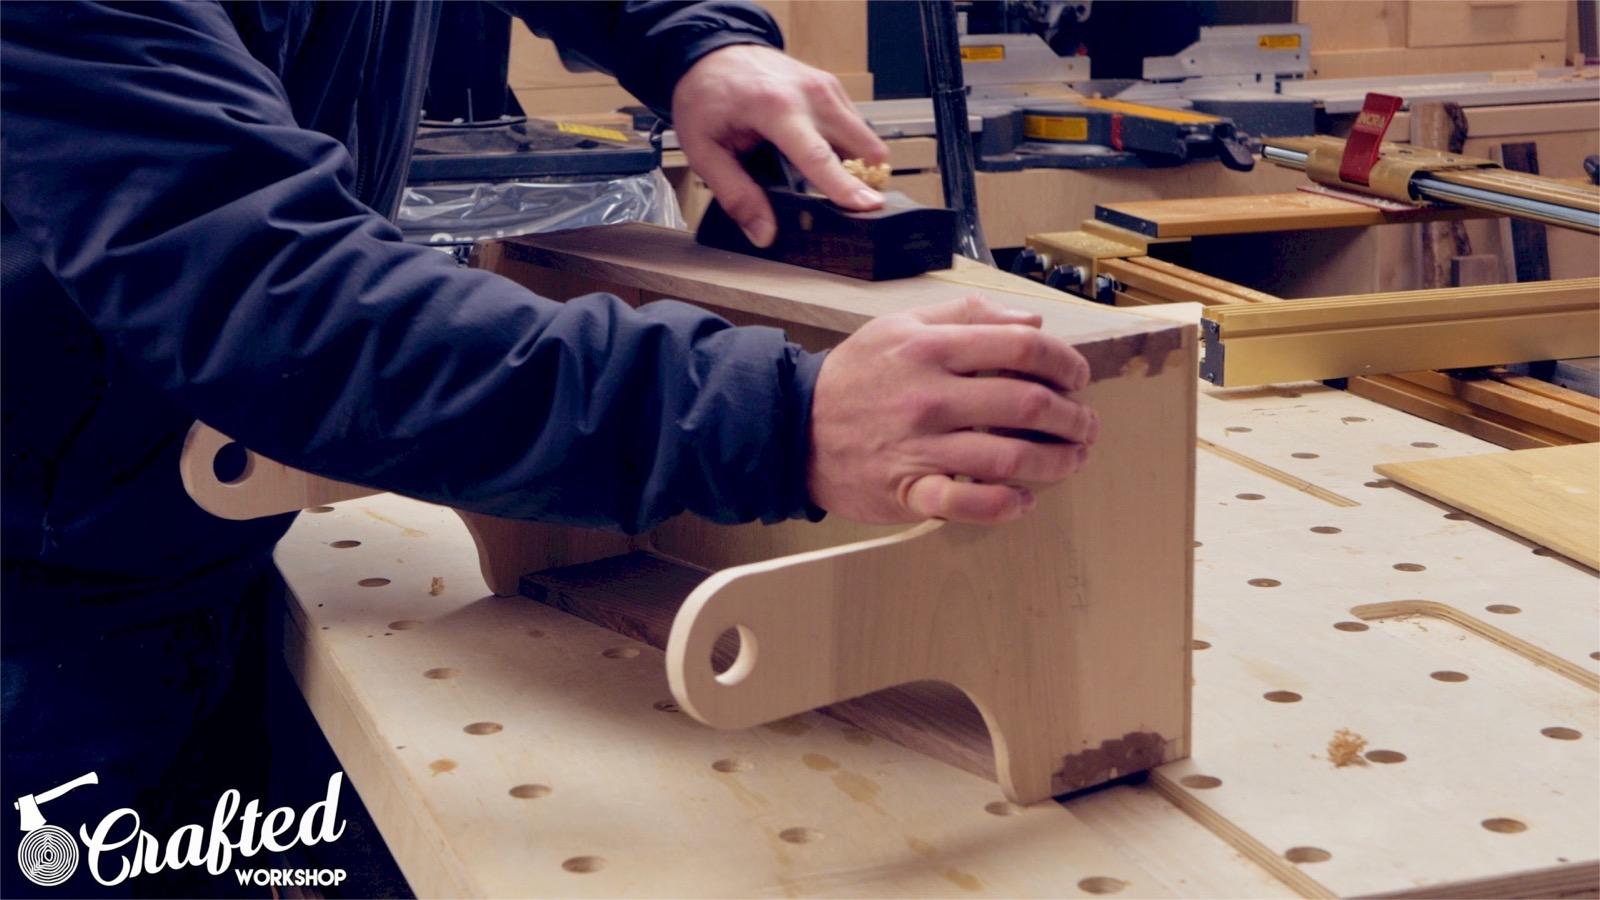 flushing edges using block plane